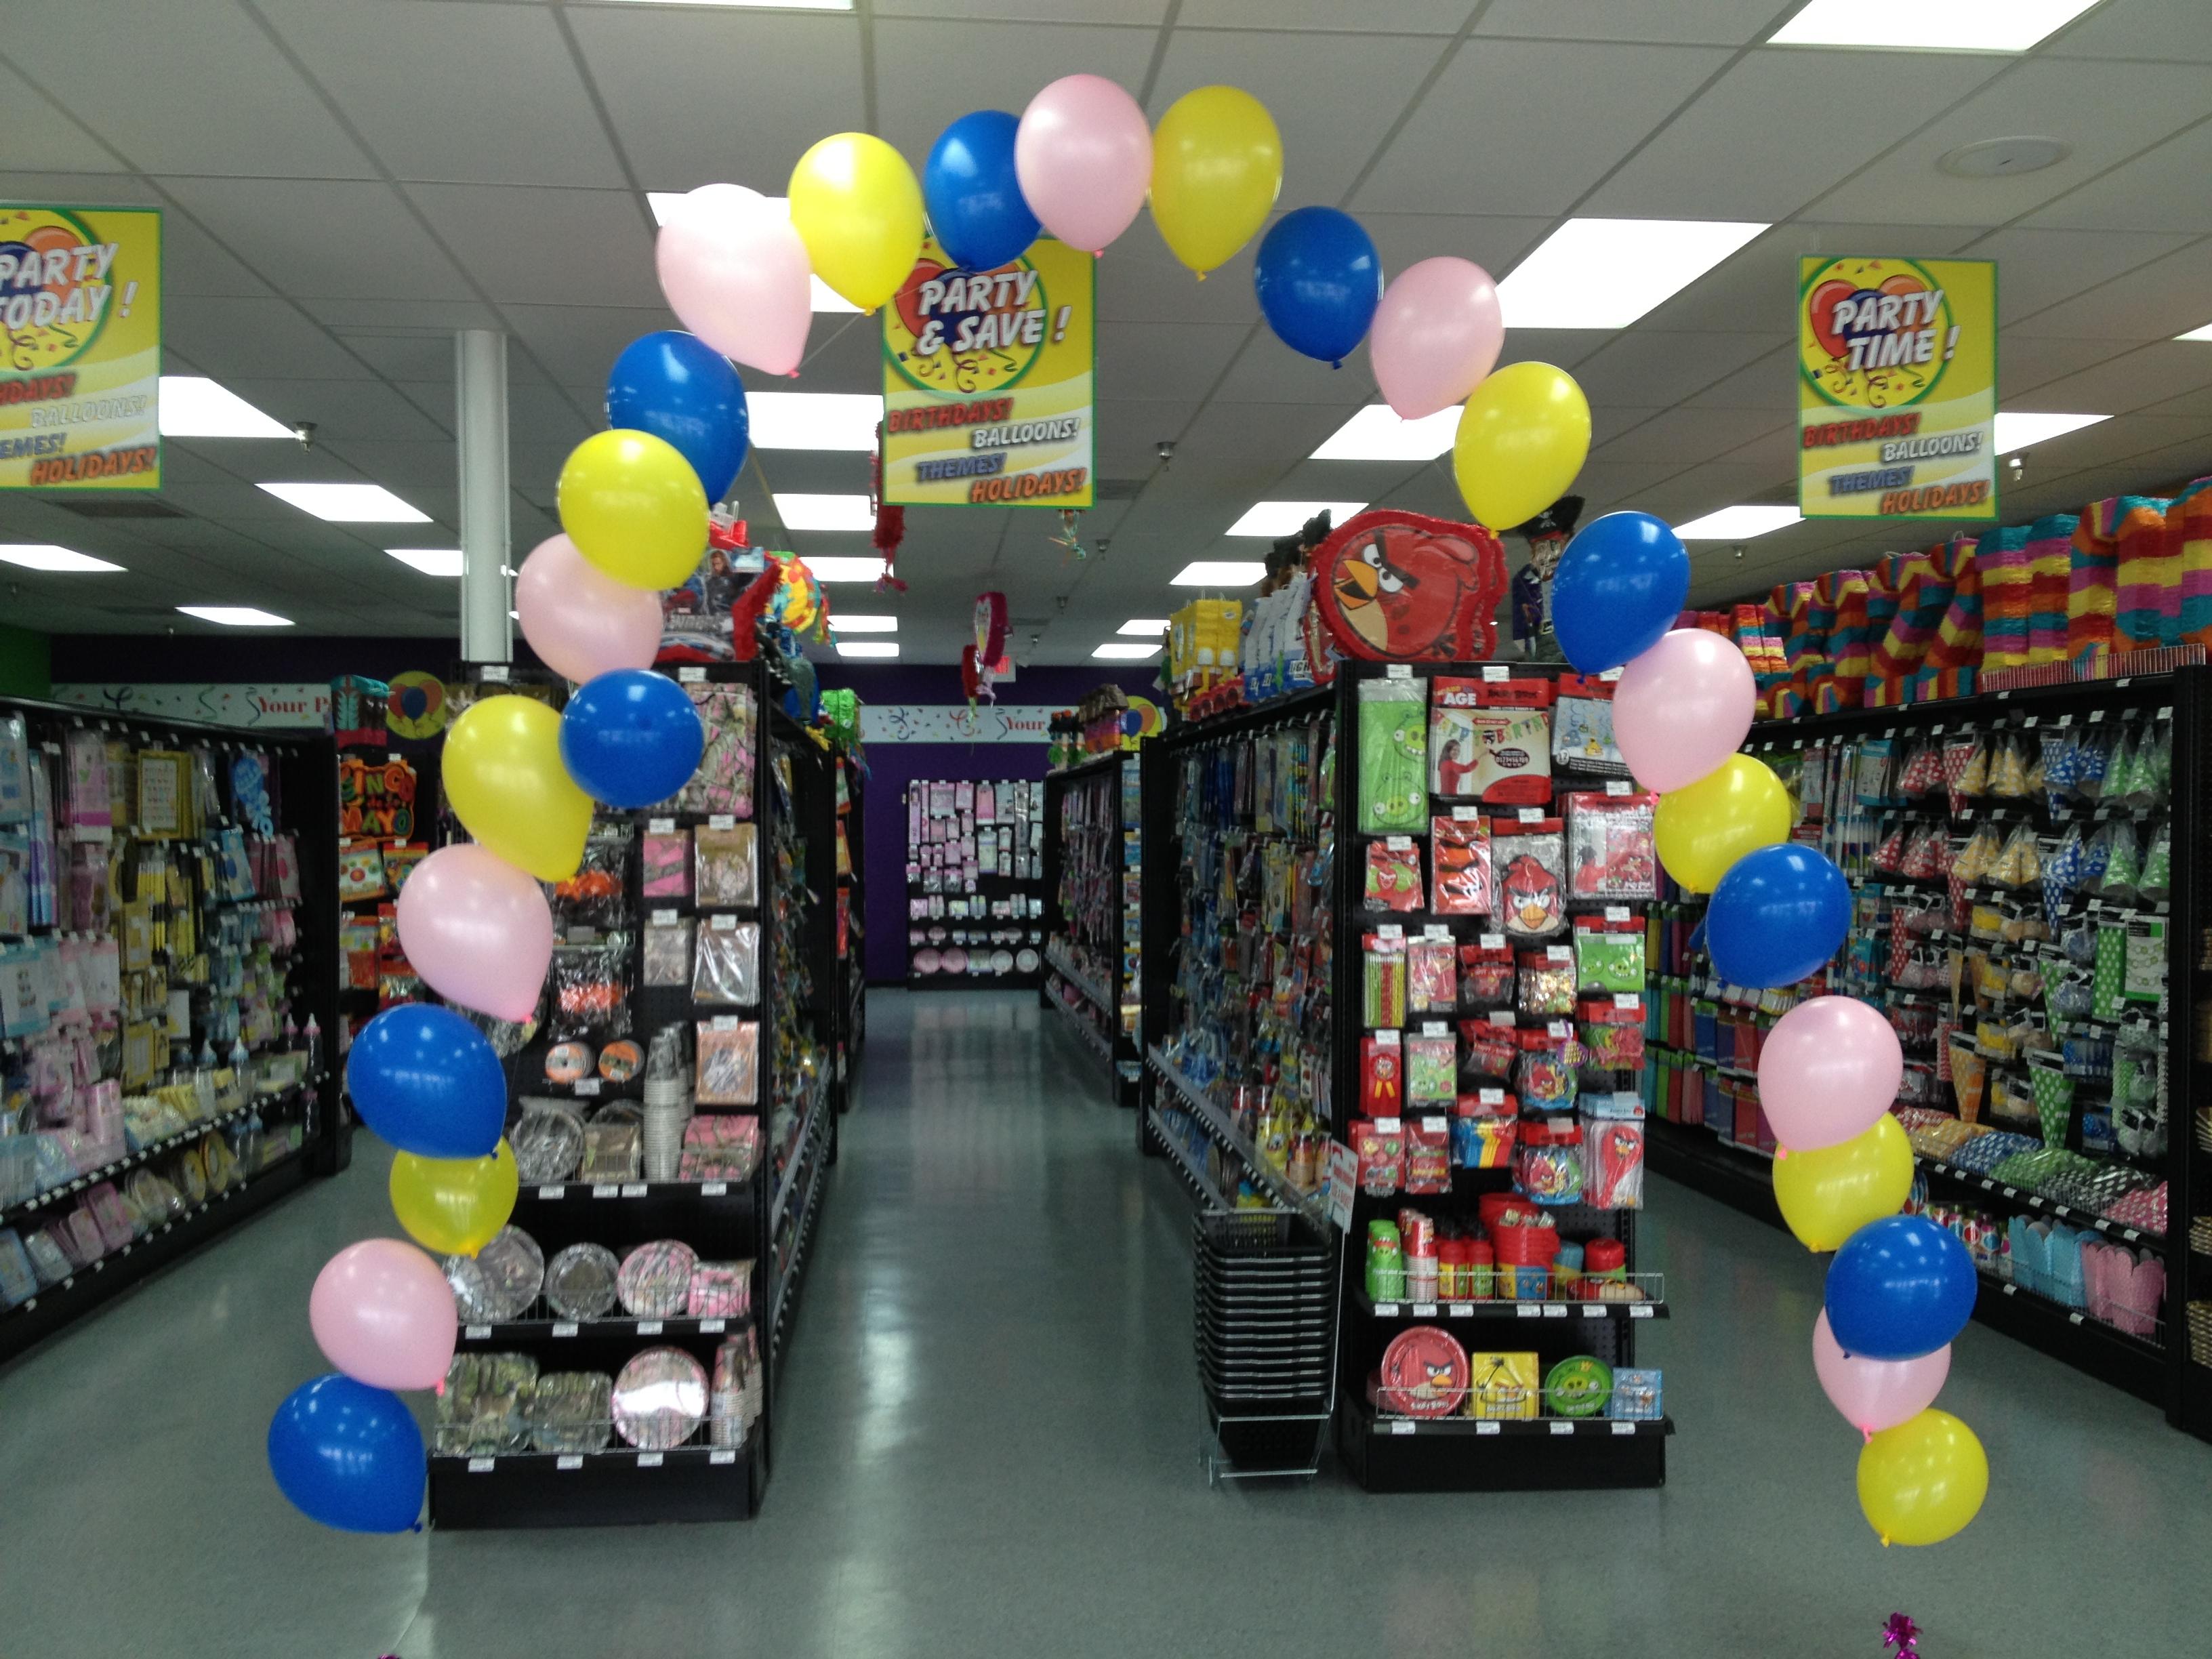 Celebrate! Party Store Tullahoma, TN 37388 - YP.com